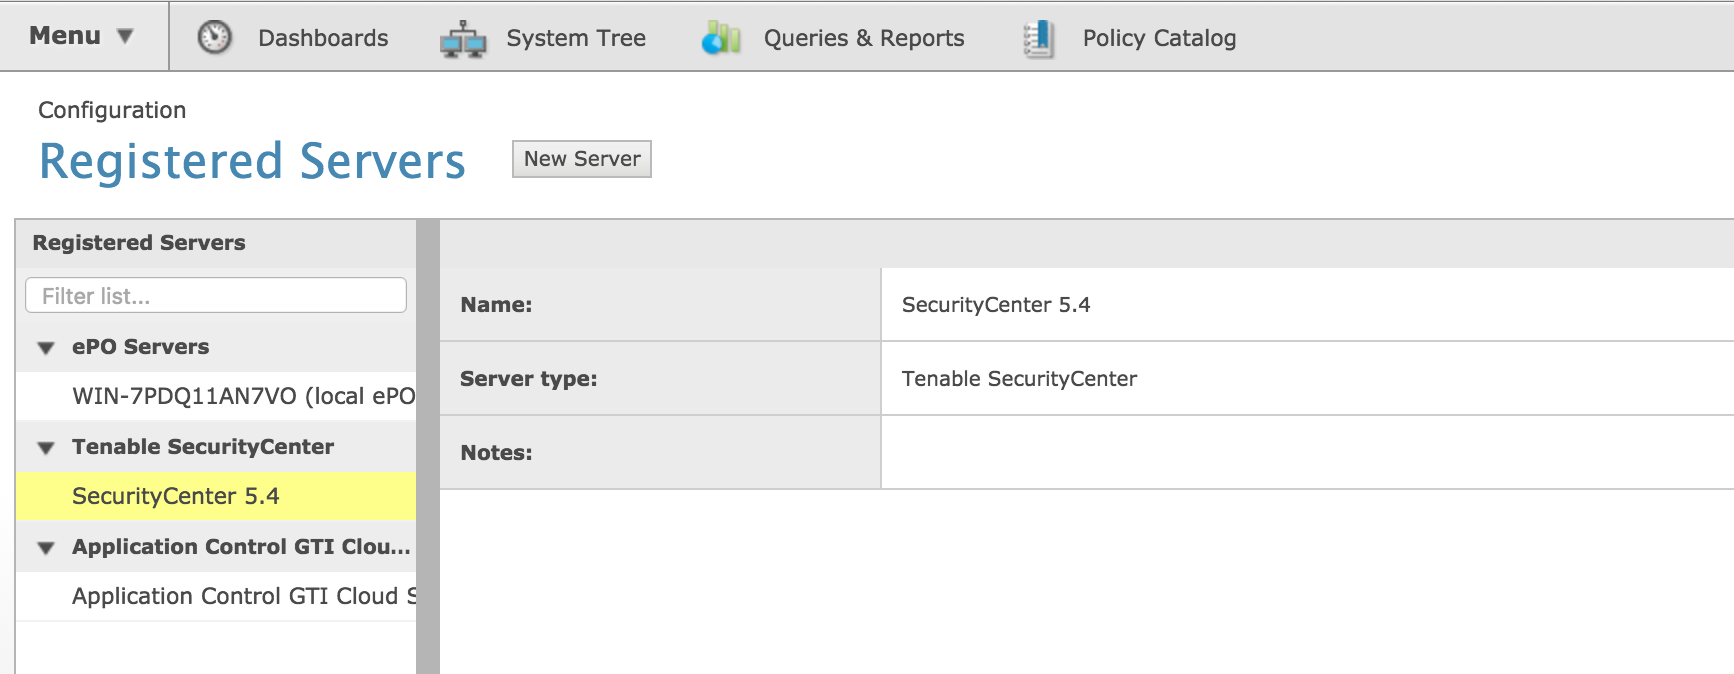 List of Registered Servers